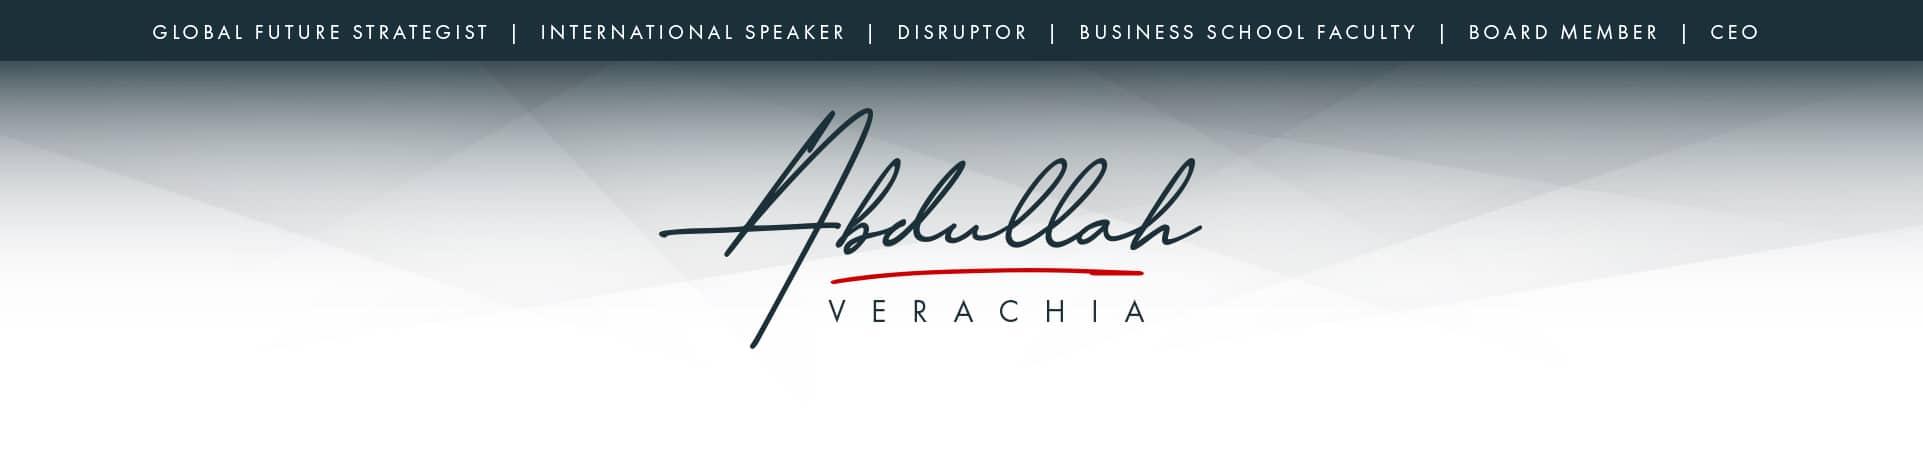 Abdullah Verachia - Header Image 1